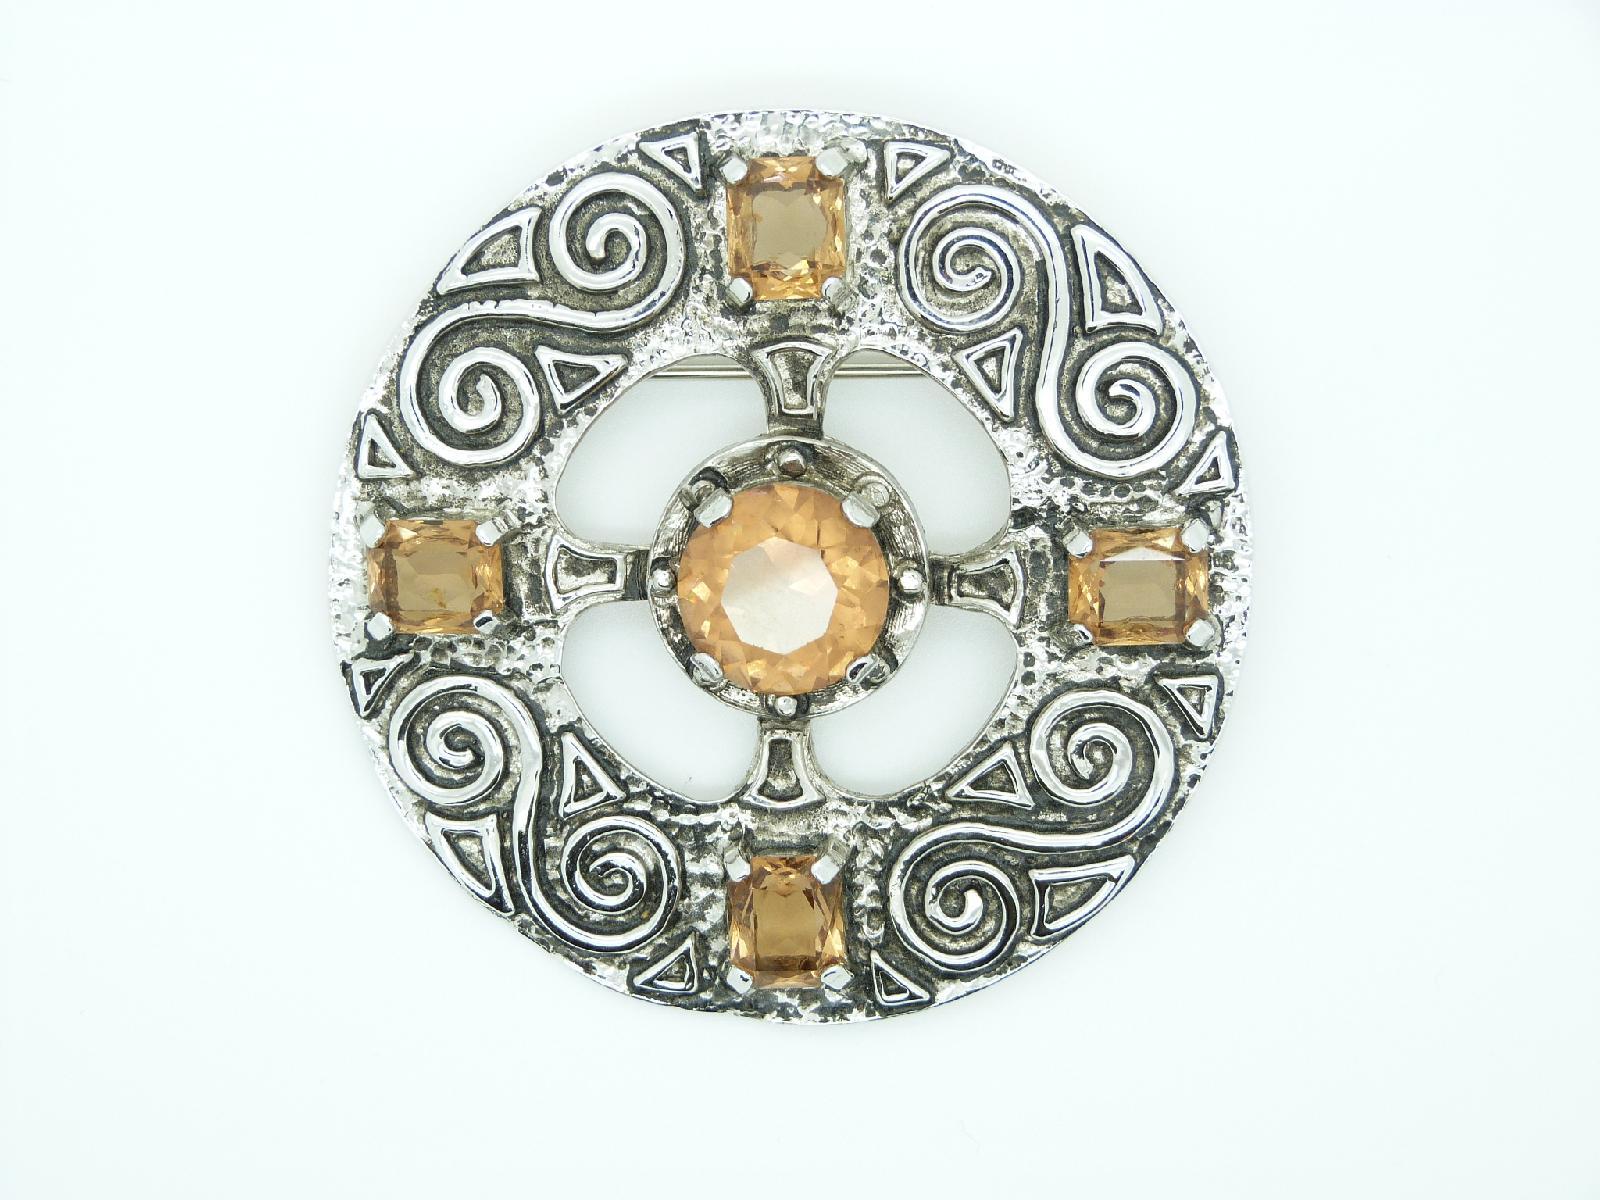 Vintage 80s Very Large Celtic Design Citrine Glass Stone Statement Brooch